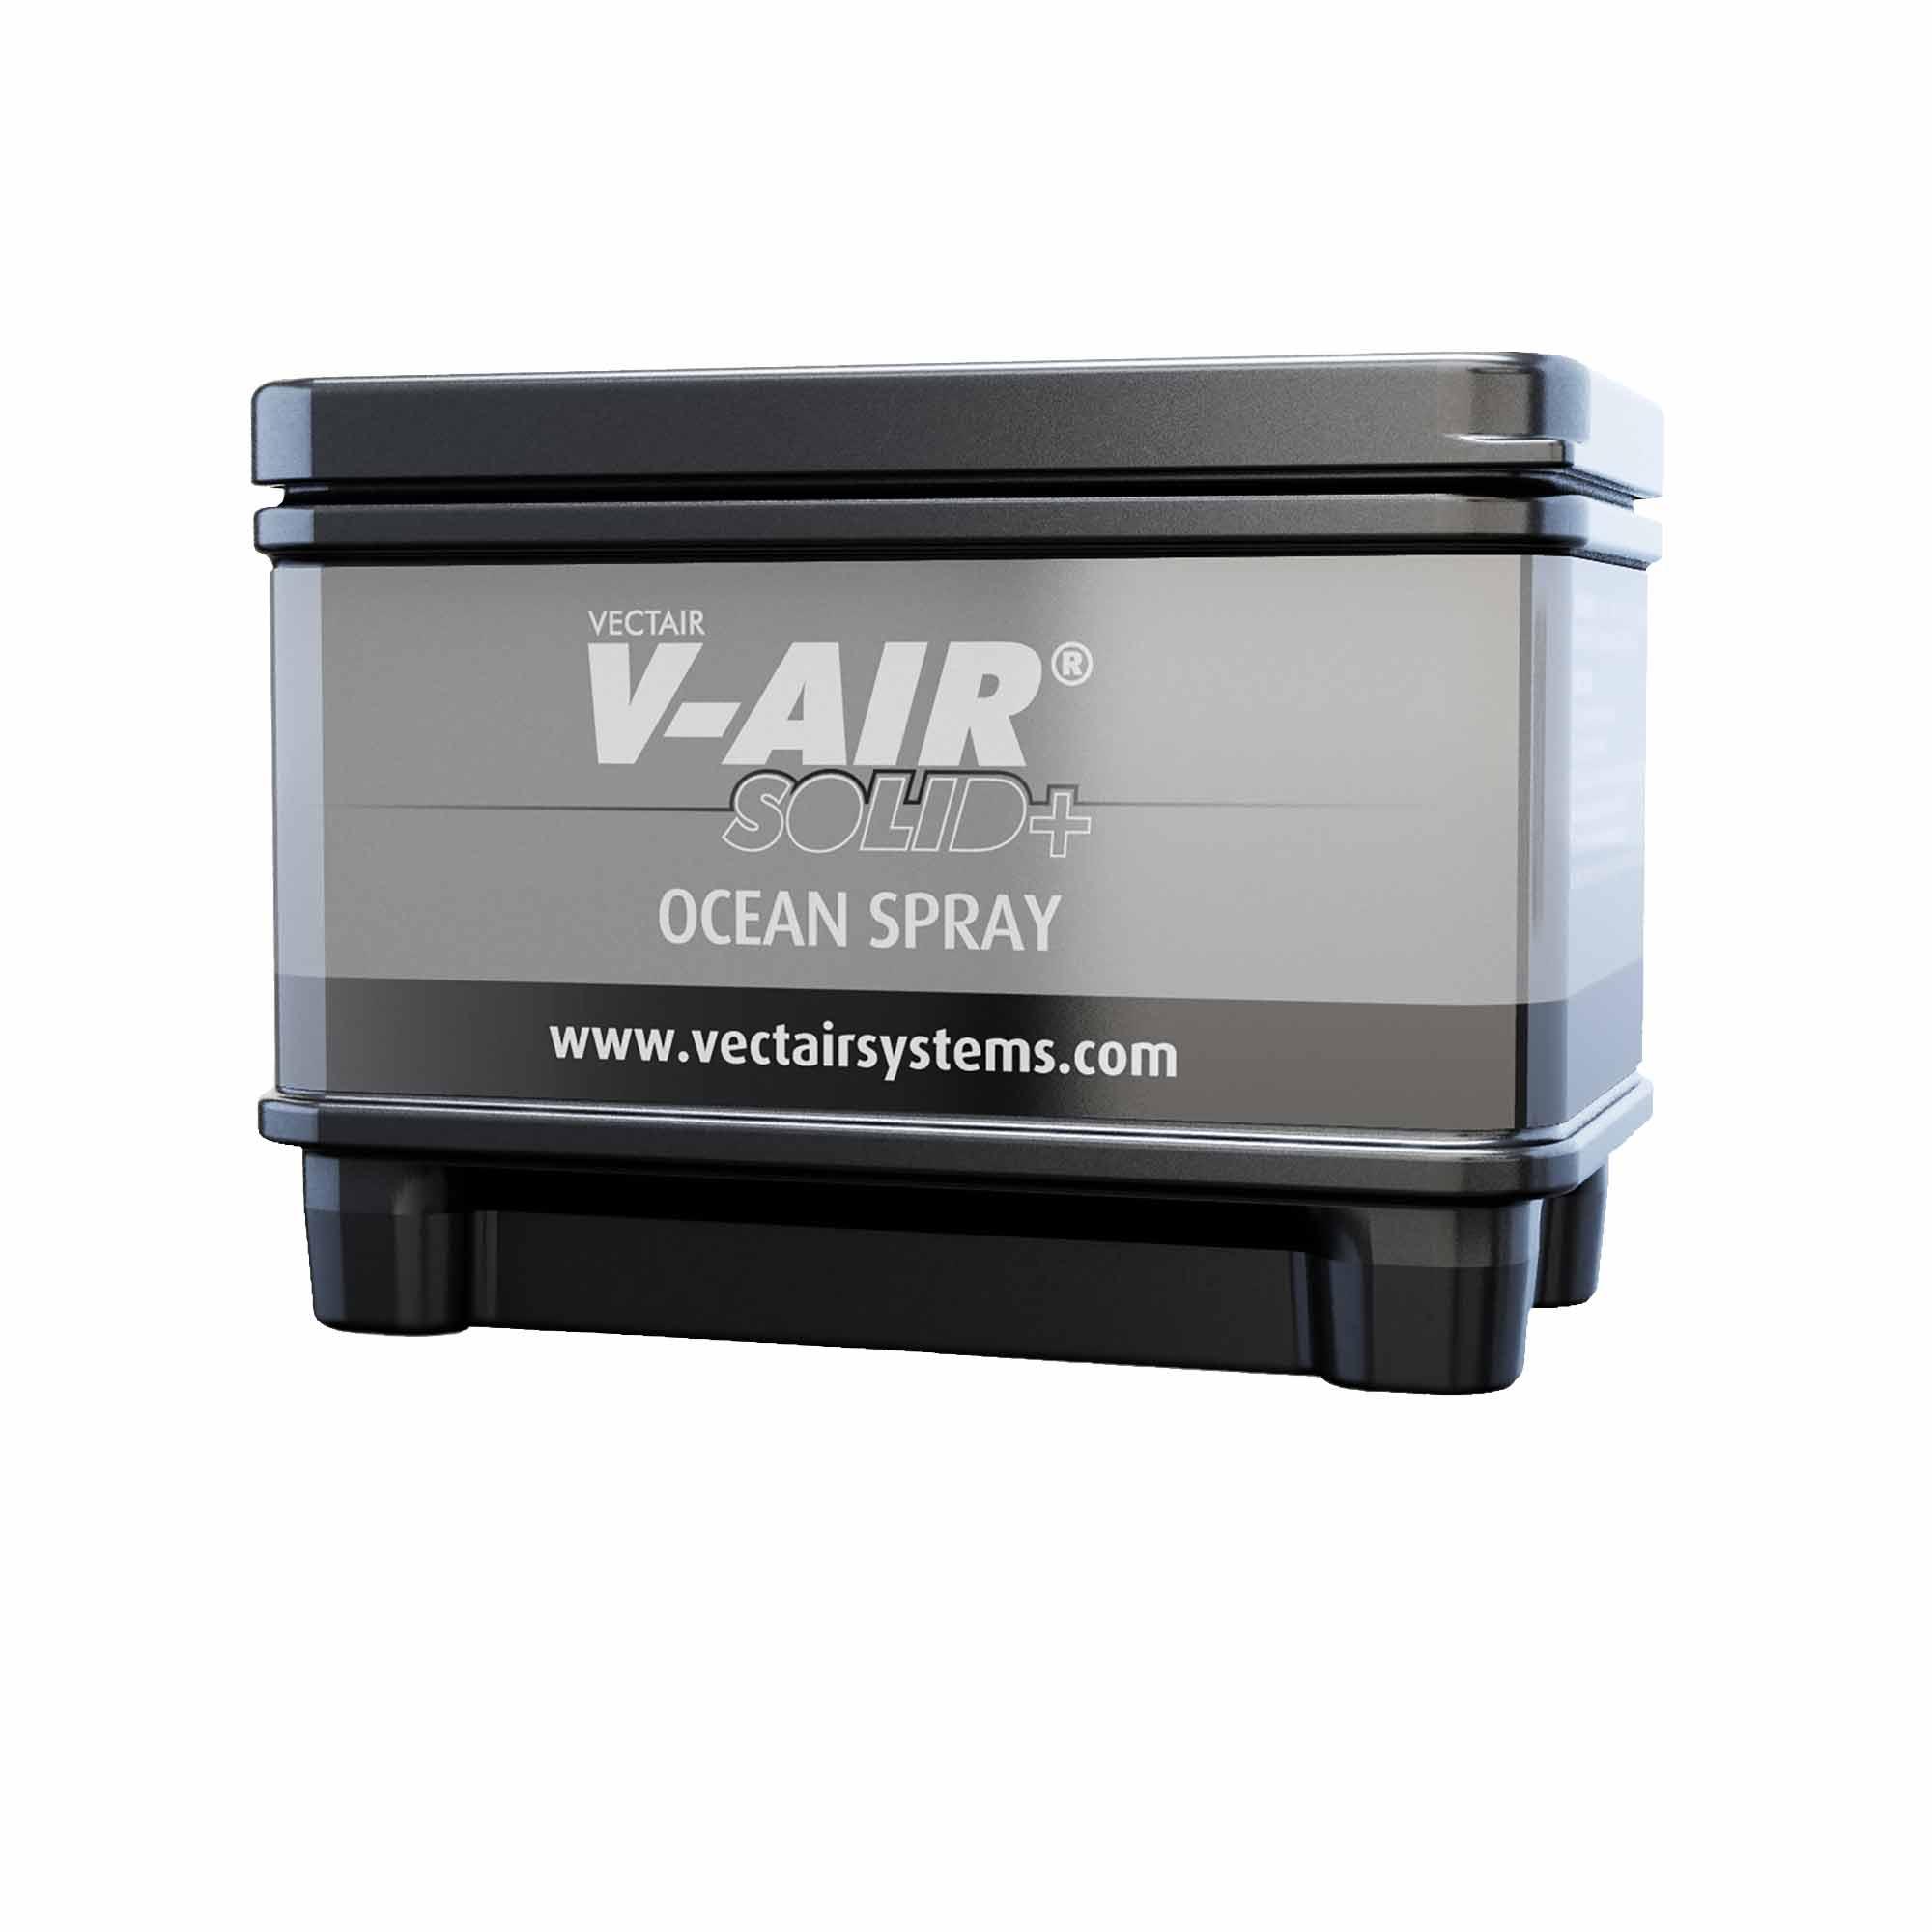 V-Air SOLID Plus Ocean Spray